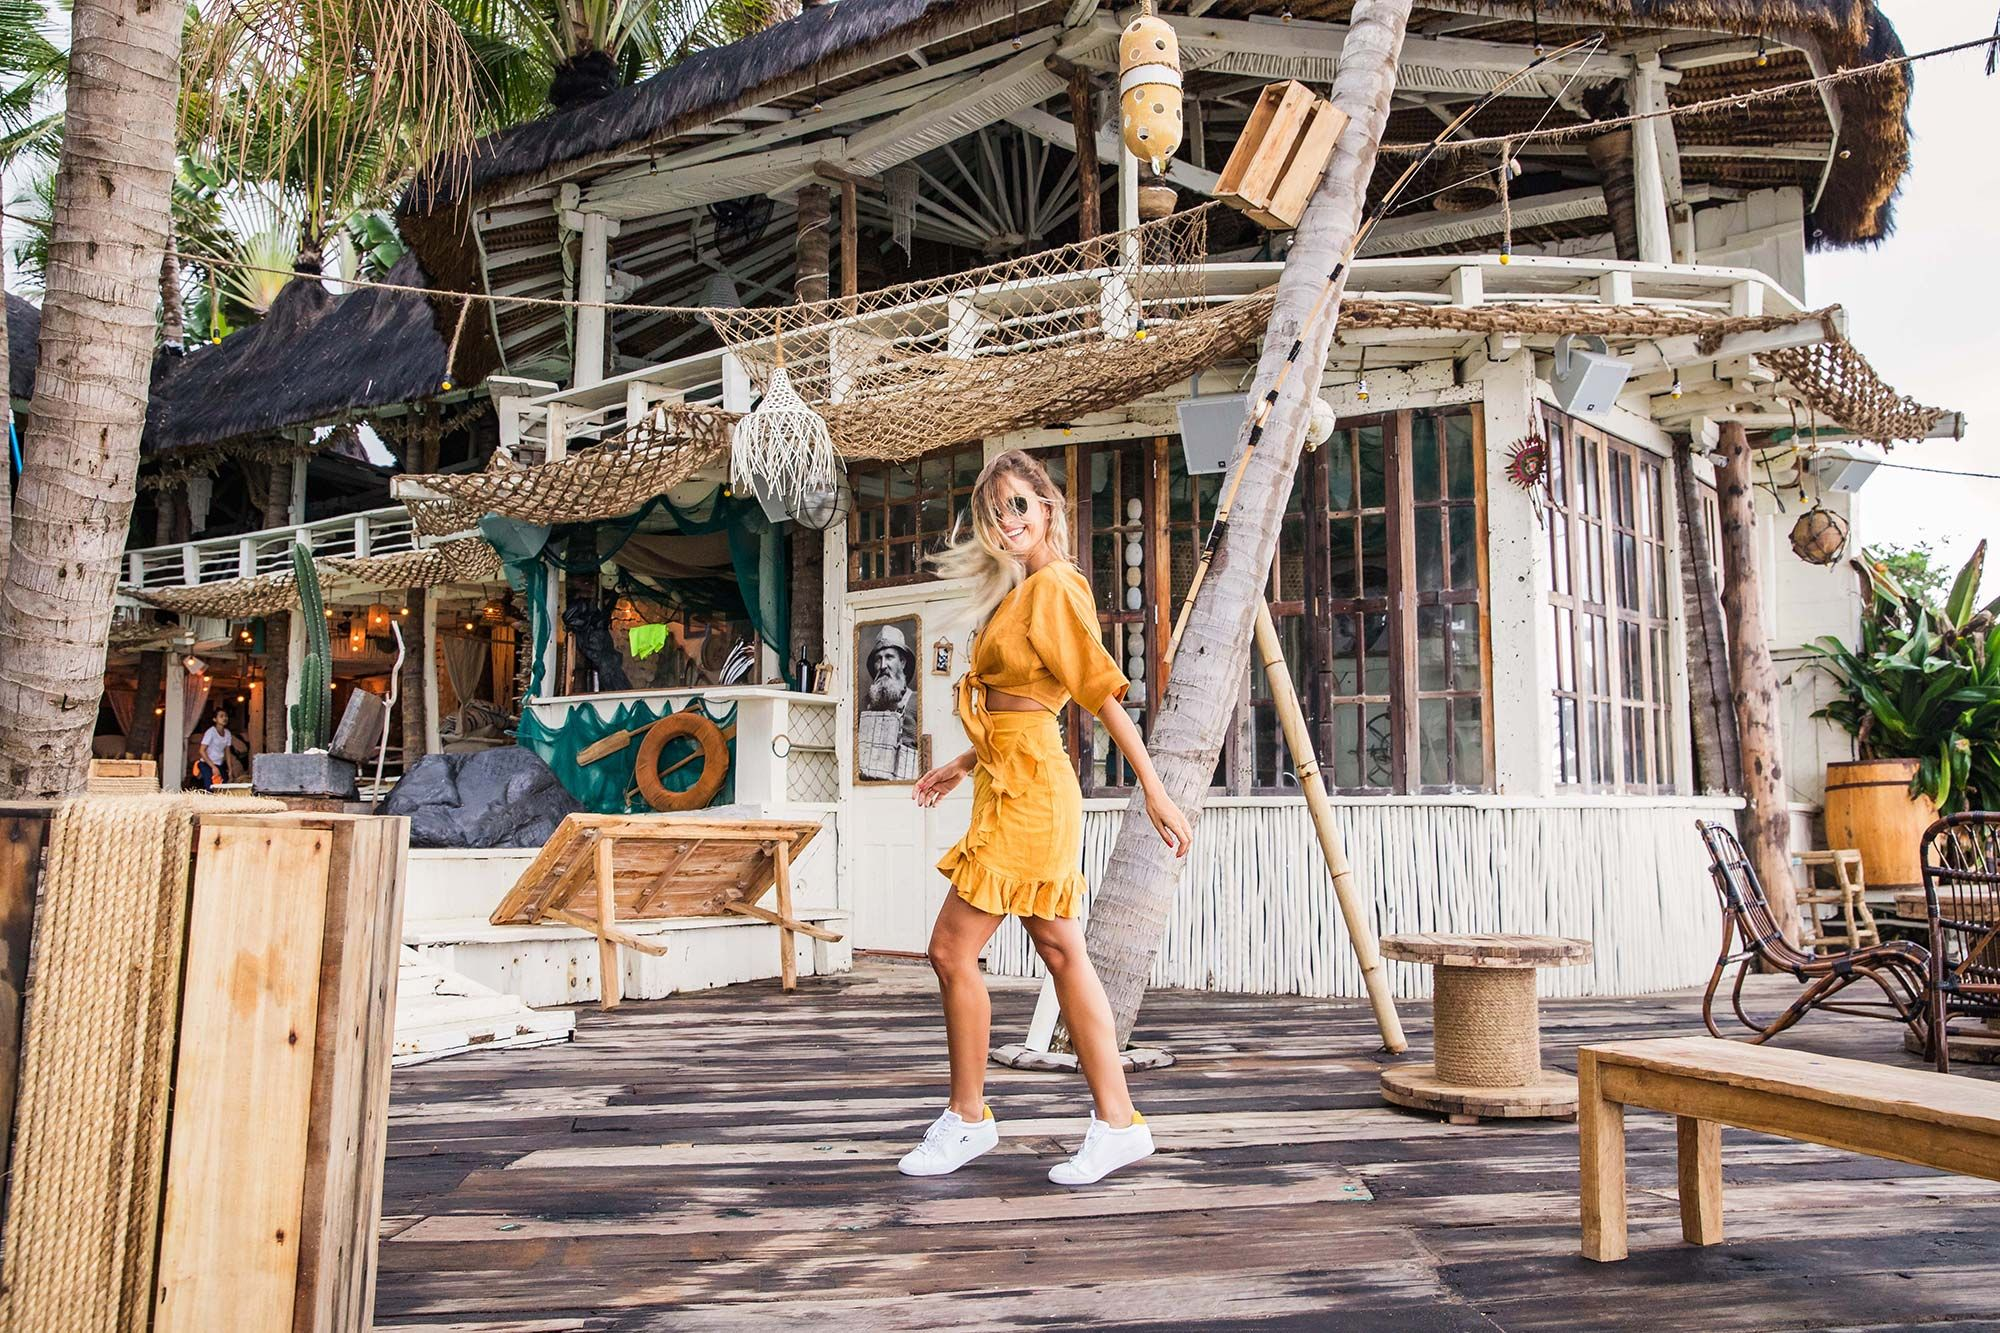 Bared_Footwear_La_Brisa_Bali_Travel_Summer_Womens_Campaign_Sandpiper_Sneakers_Yellow_Dress